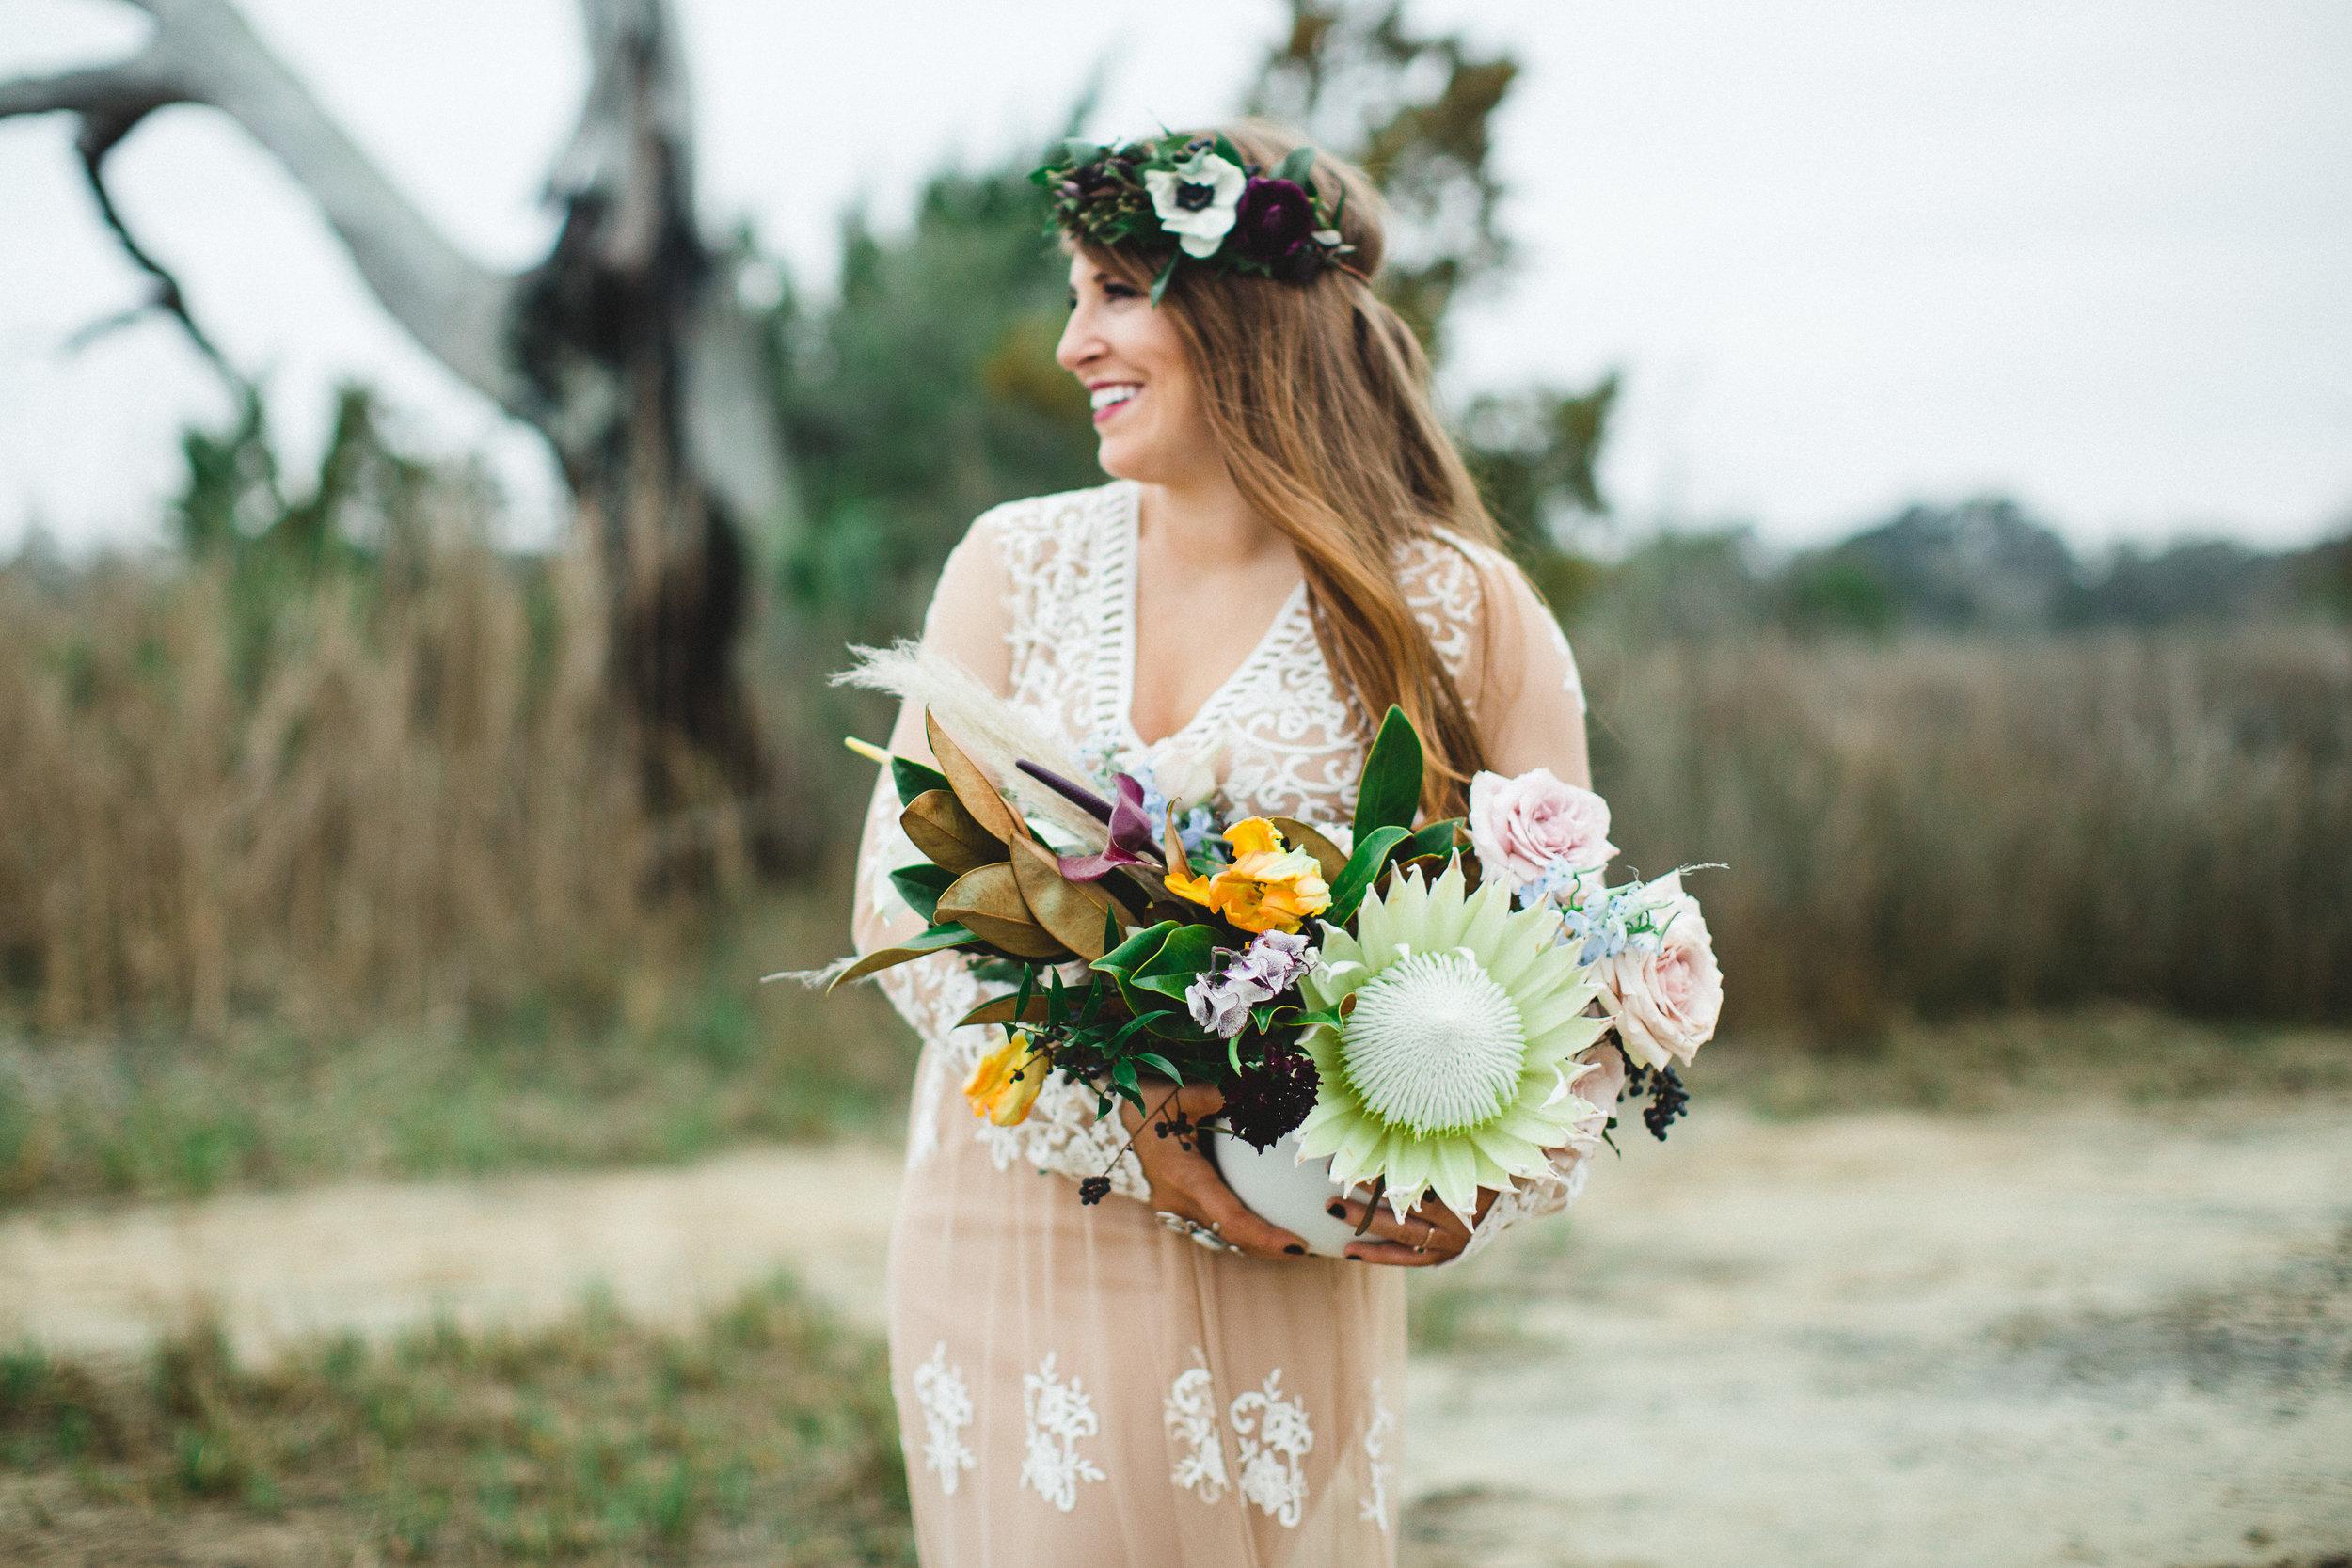 savannah-wedding-florist-savannah-florist-ivory-and-beau-savannah-wedding-planner-event-designer.jpg